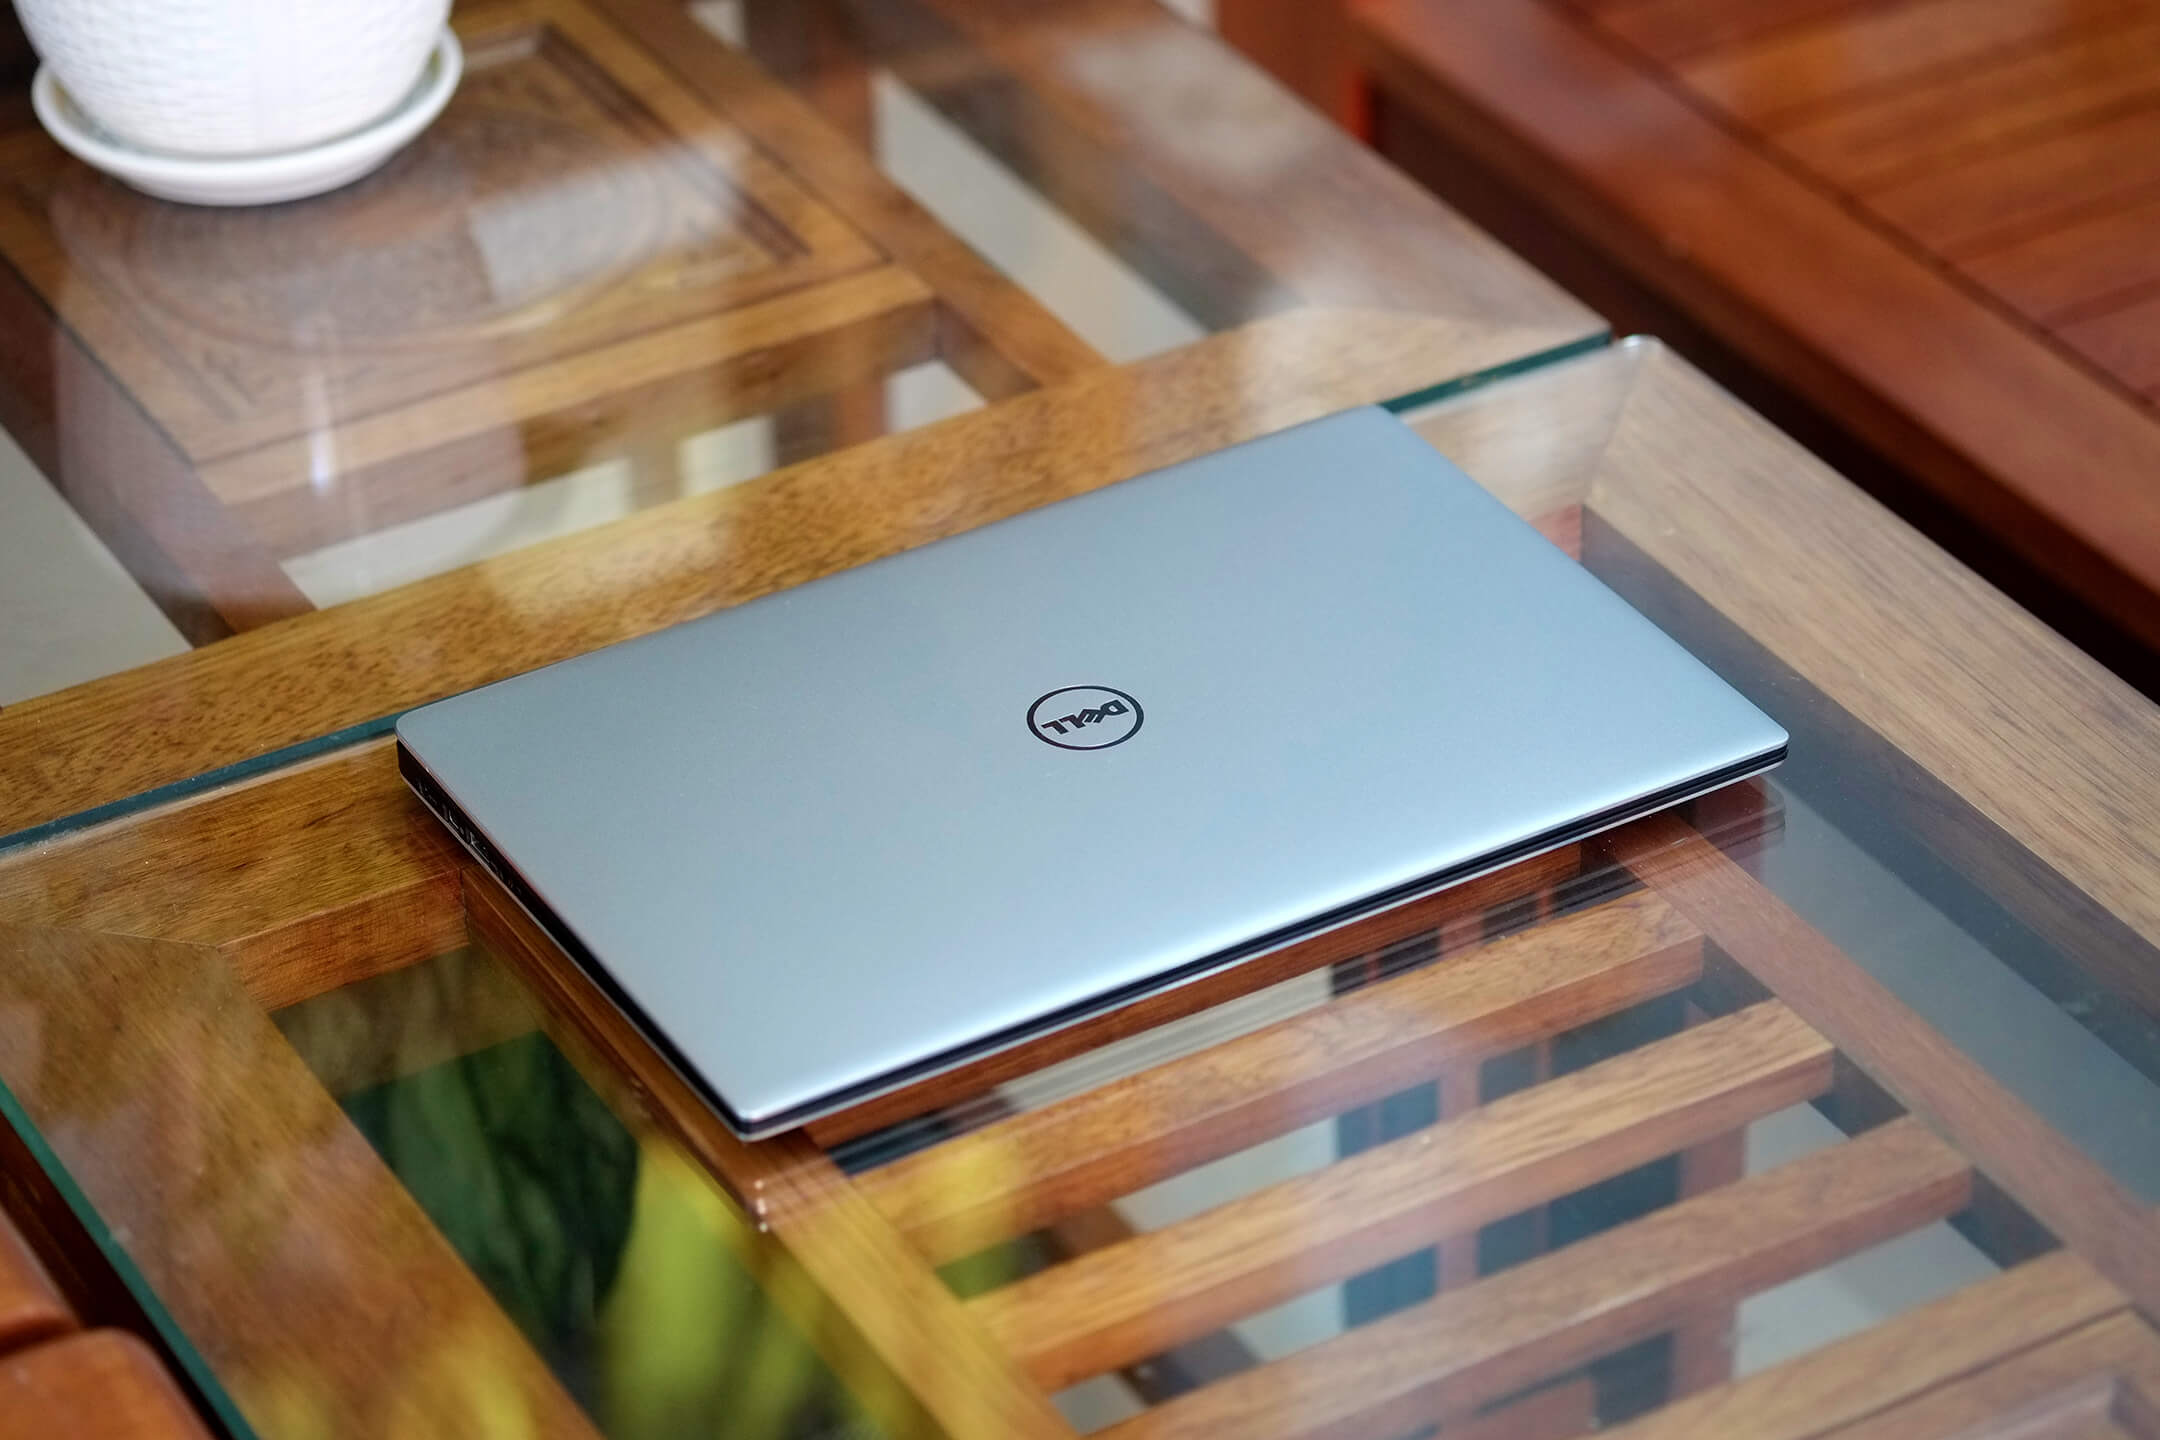 Dell Xps 13 9343 i7 5600u / 8GB / 256GB / 13.3-inch QHD Touch / New 99%